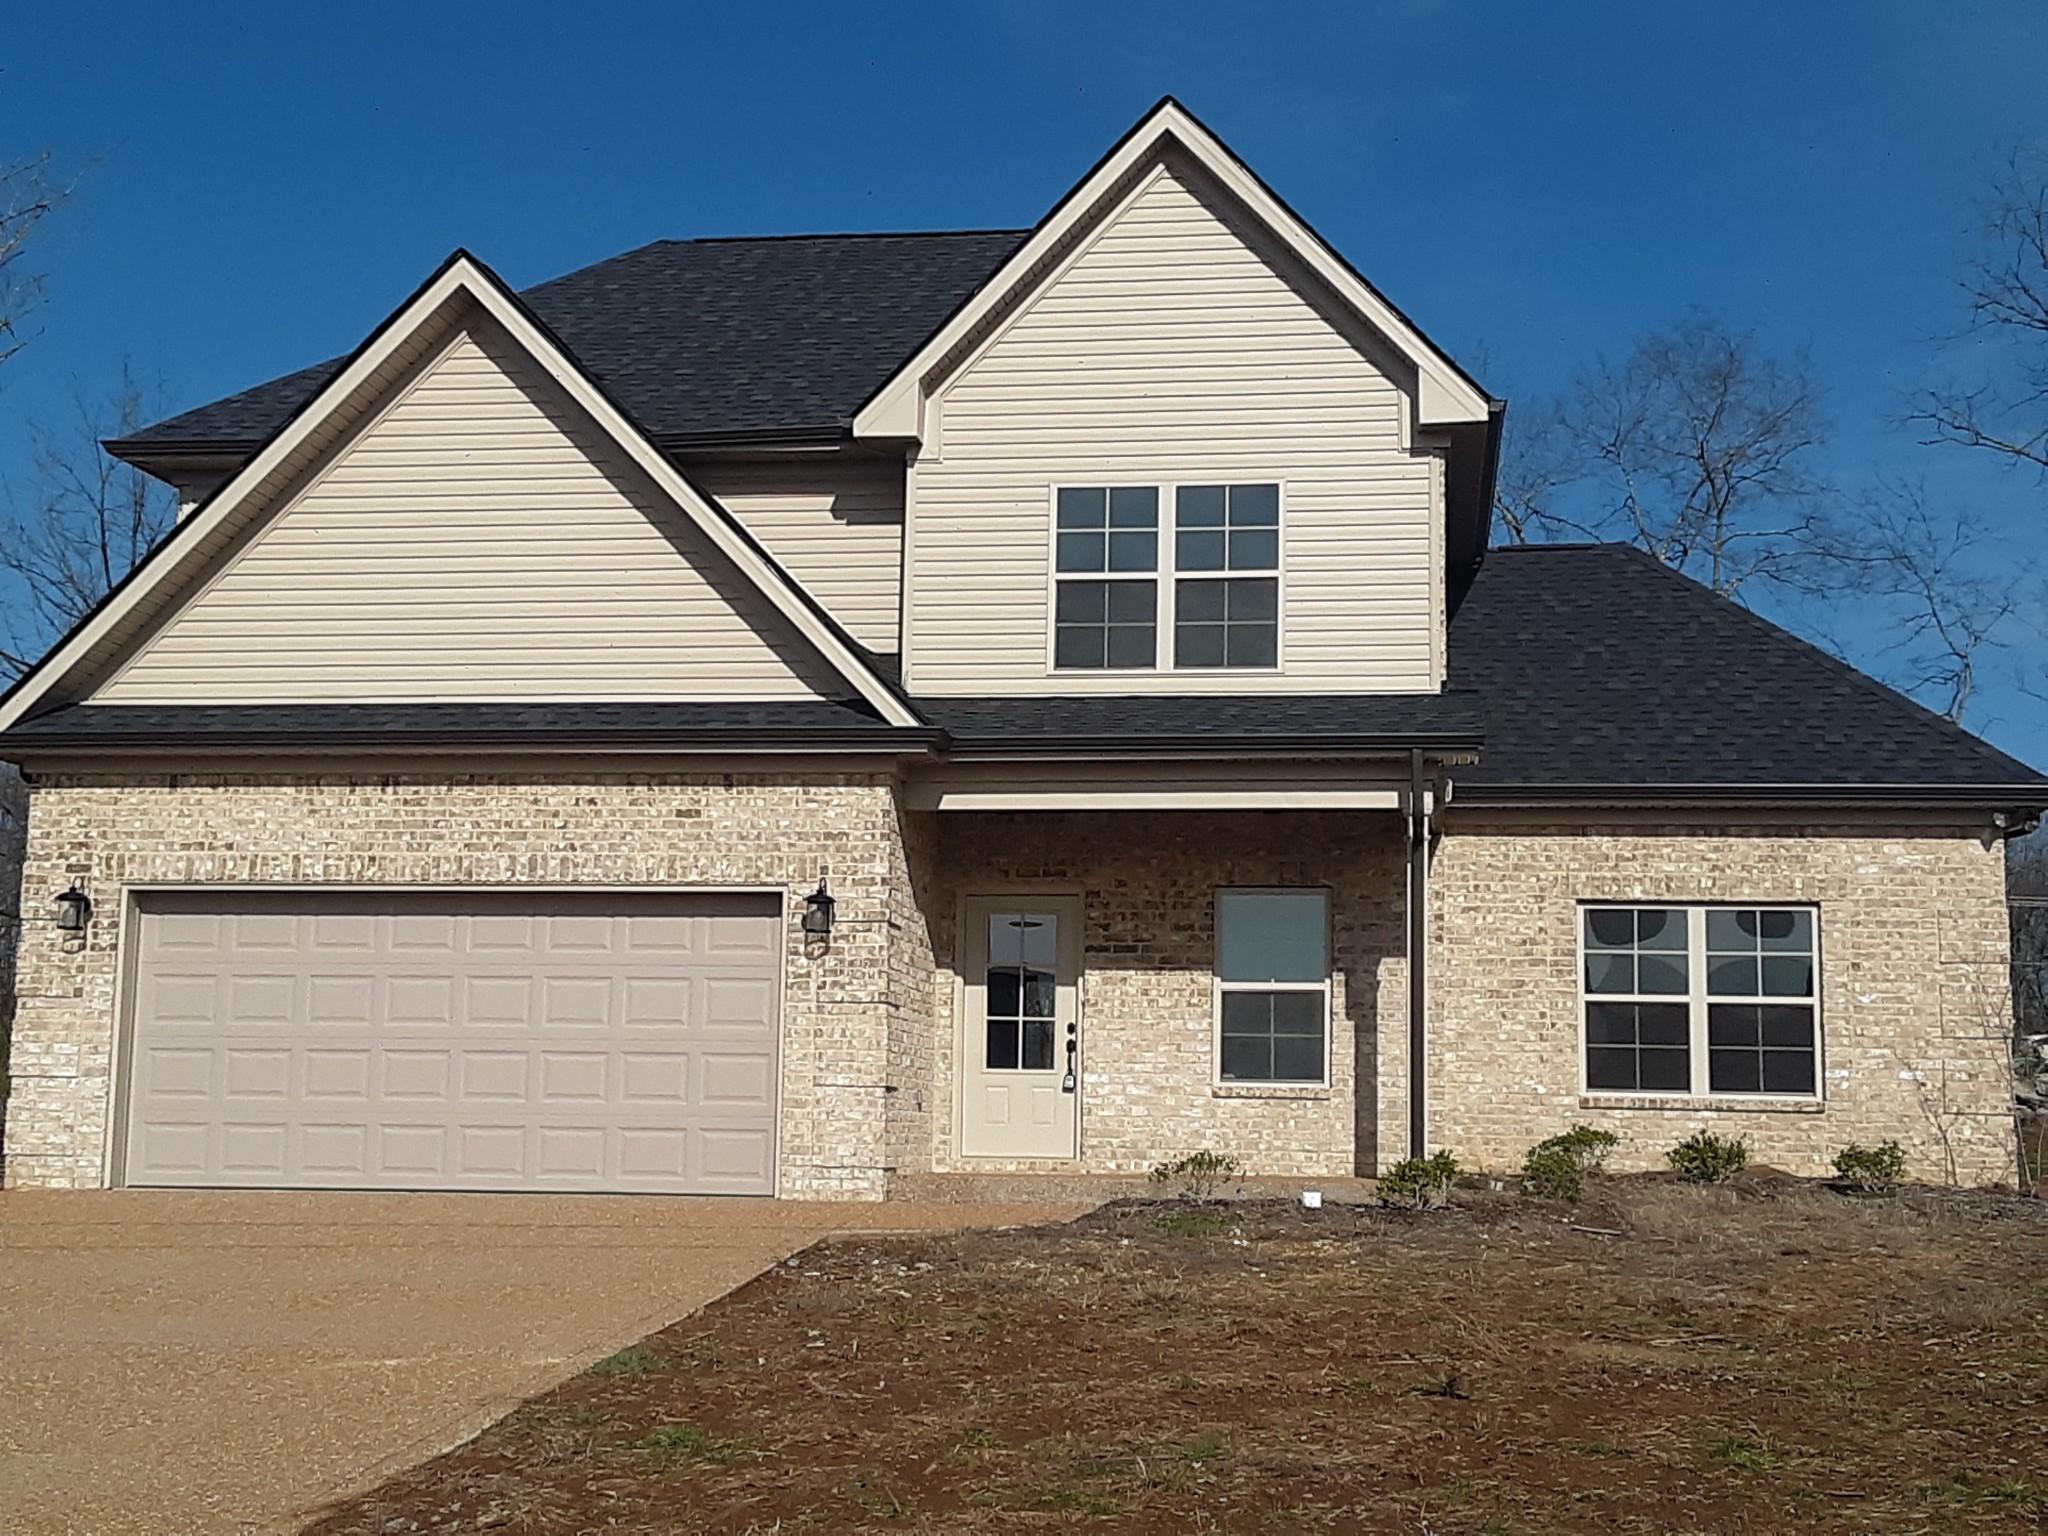 1173 Rimrock Rd, Smyrna, TN 37167 - Smyrna, TN real estate listing